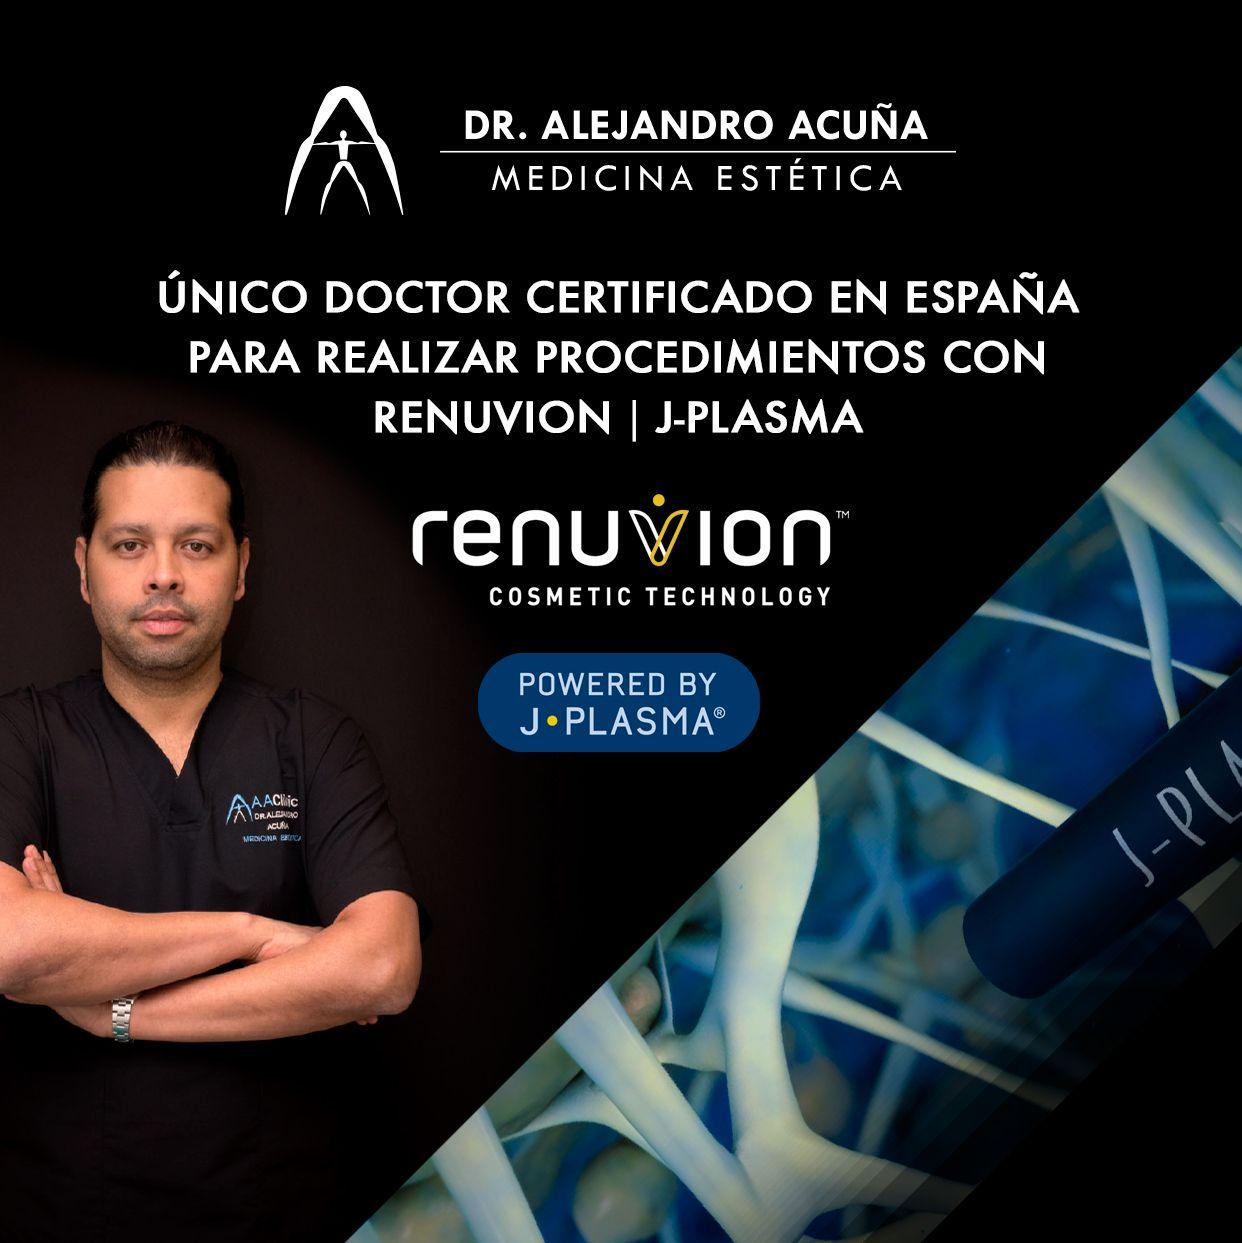 Dr. Alejandro Acuña